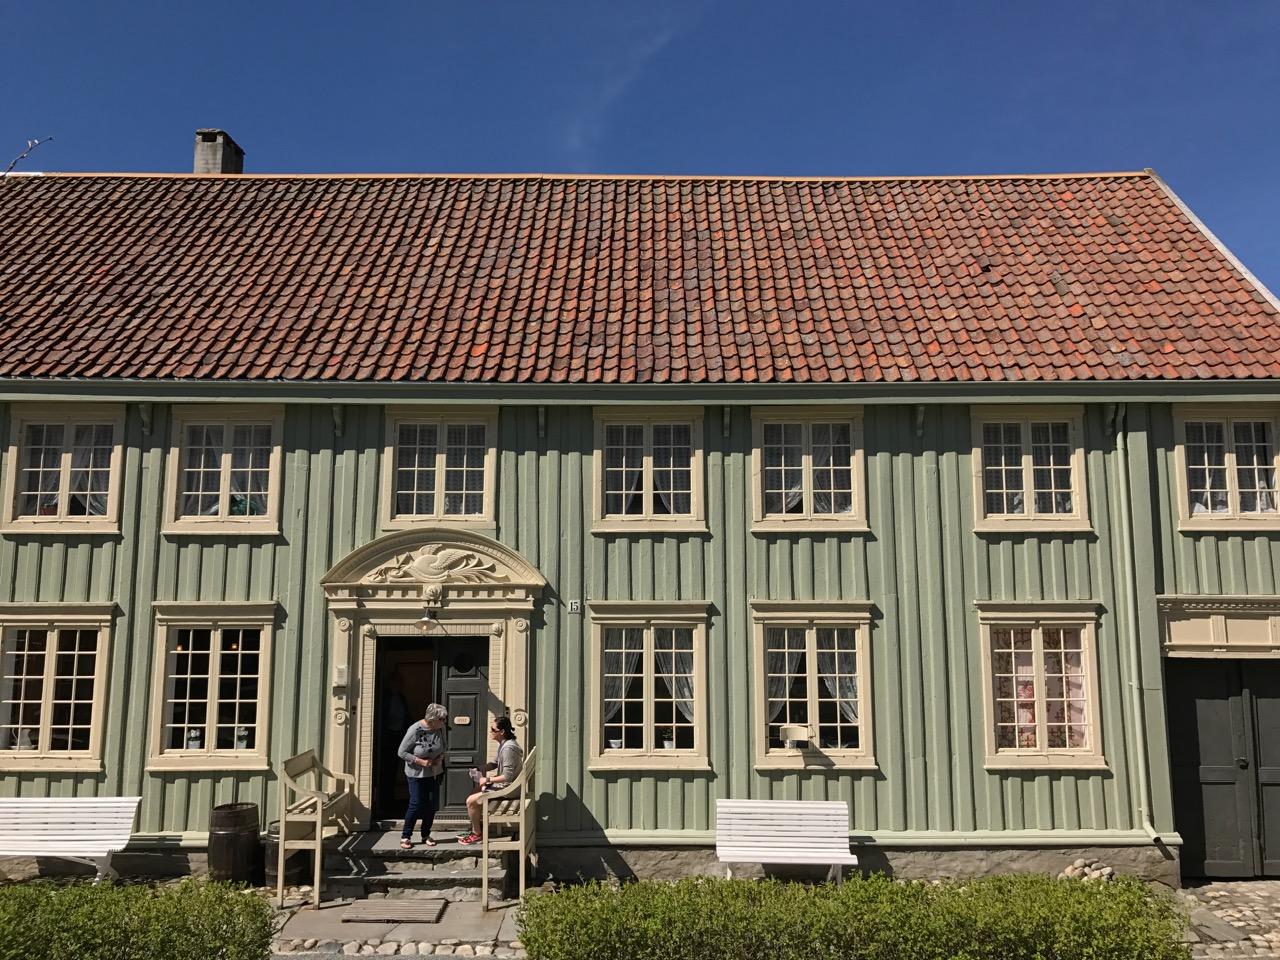 Trondheim Folk Museum